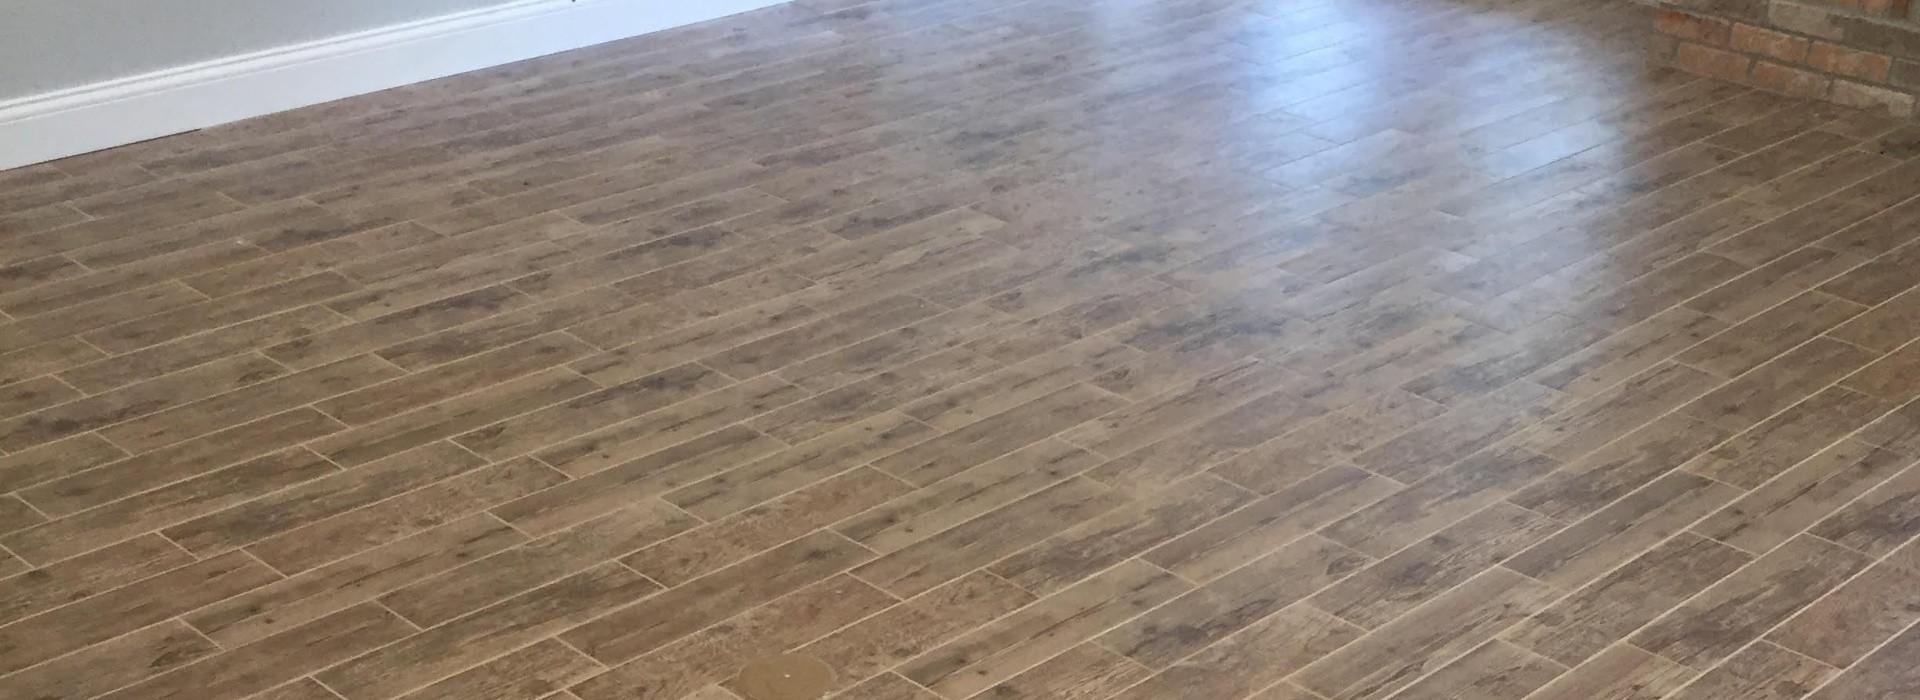 hardwood floor refinishing greenville nc of home pk floors plus pertaining to hardwood laminate countertops tile and more